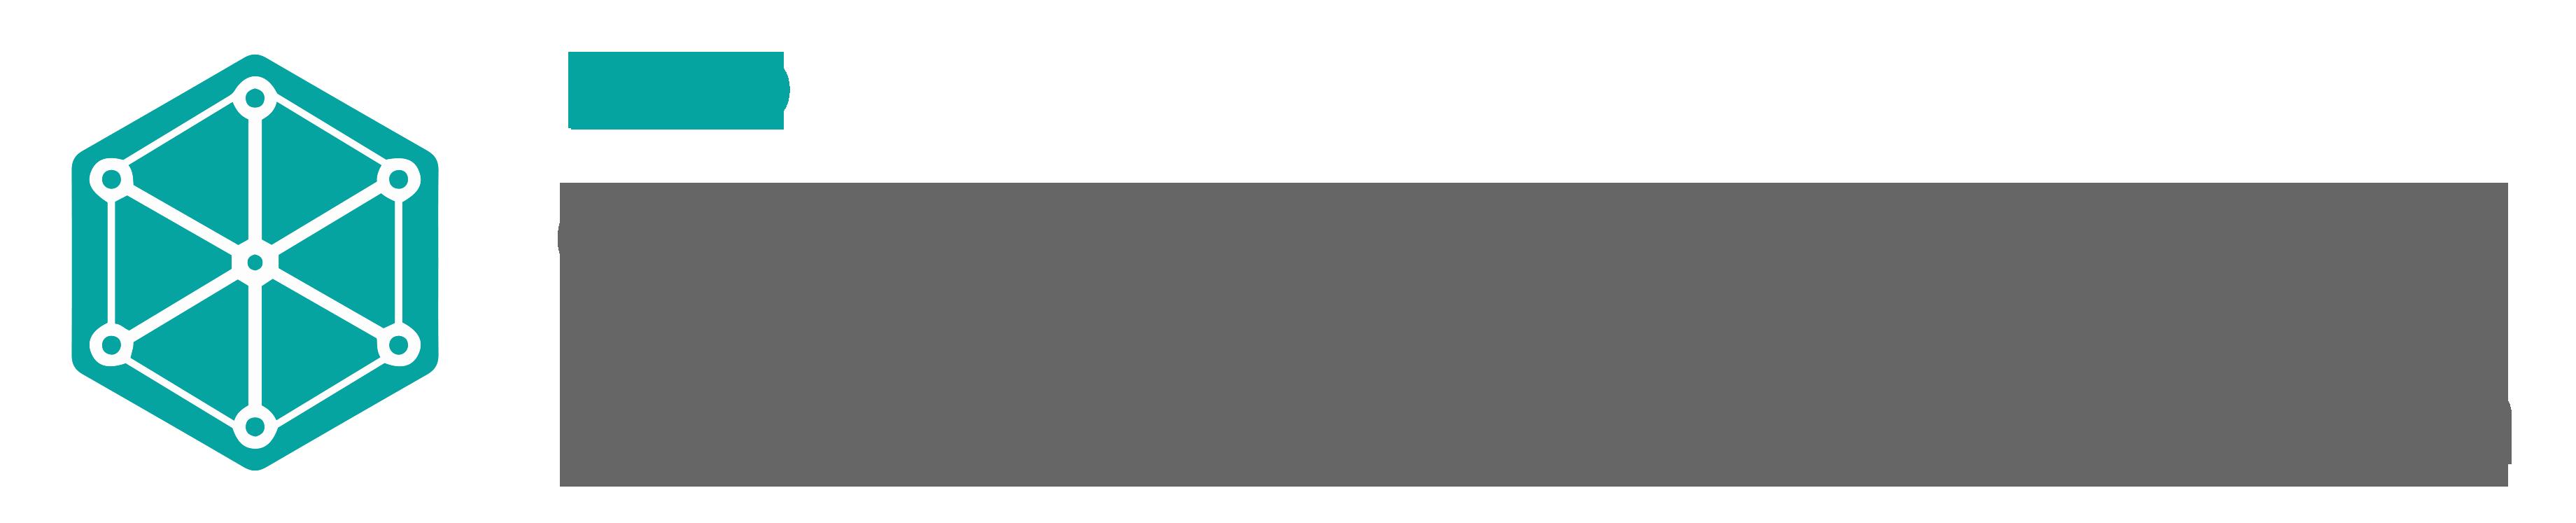 Observatorio de Reportes de Transparencia